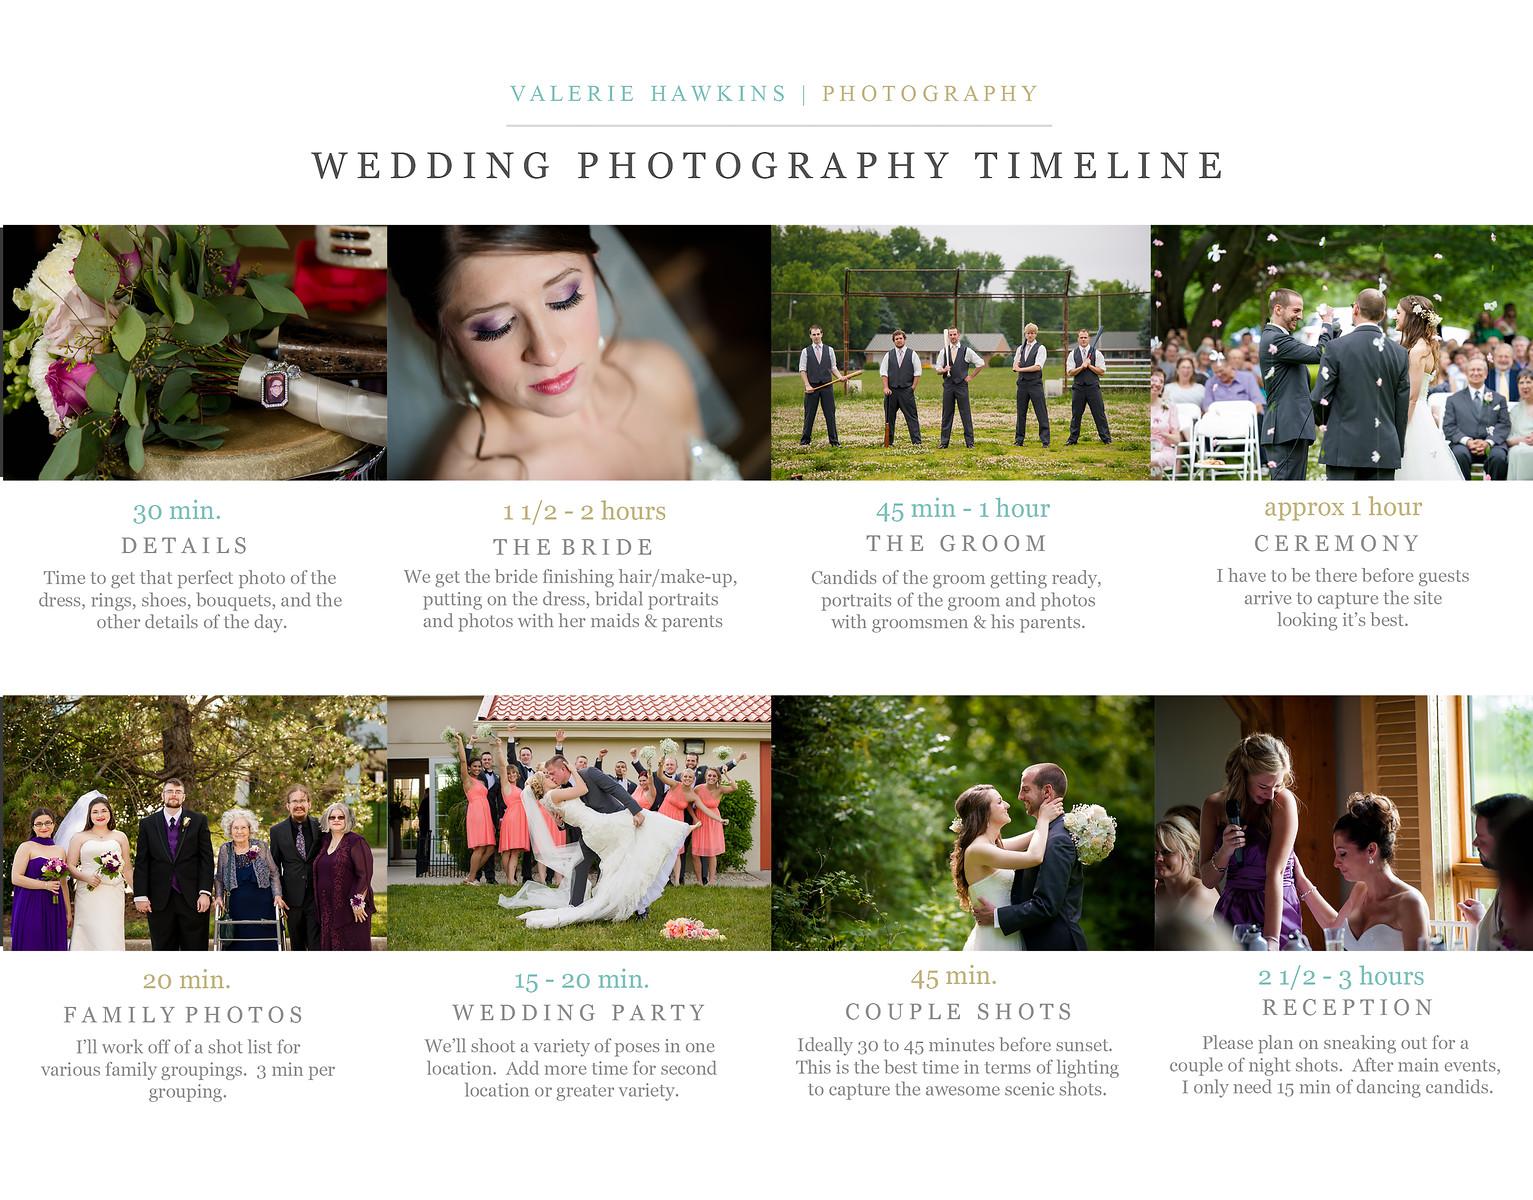 WeddingTimeline-8x11 JPEG full